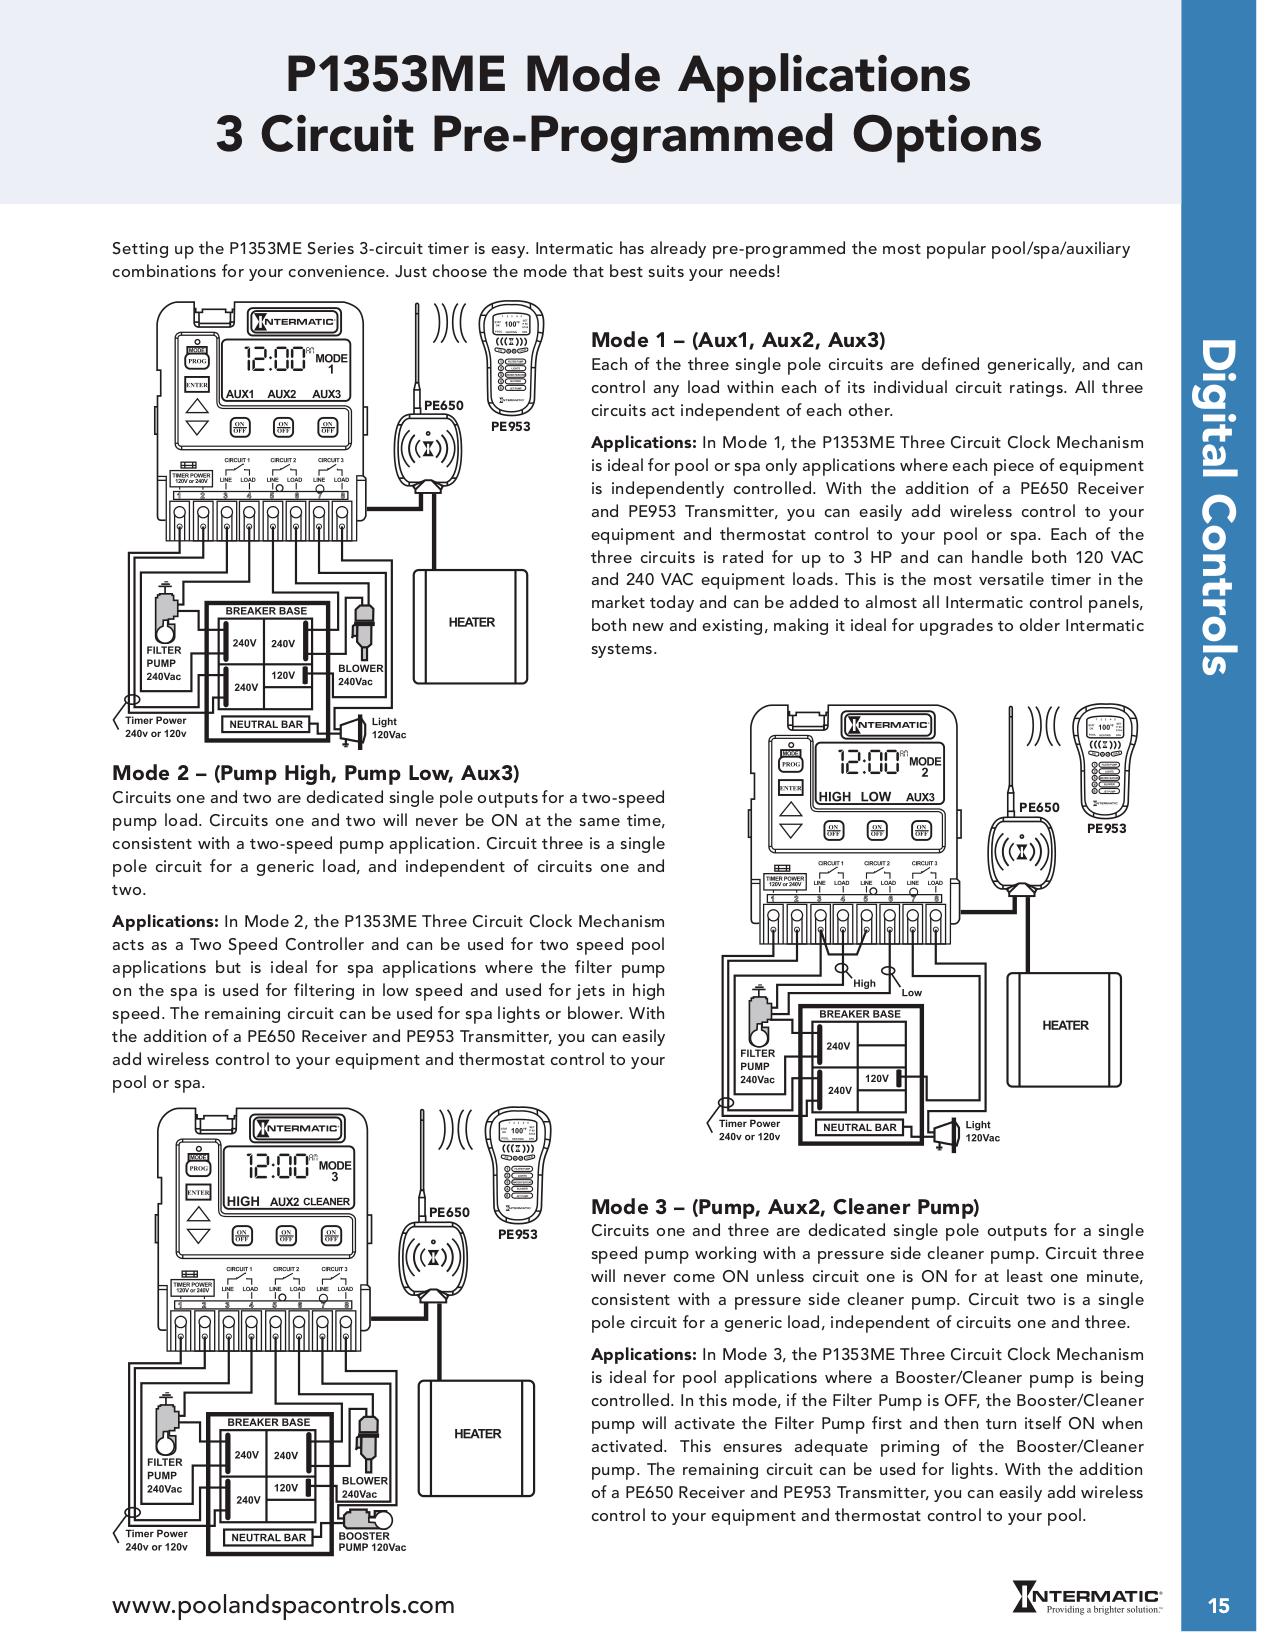 Intermatic T104 Wiring Diagram